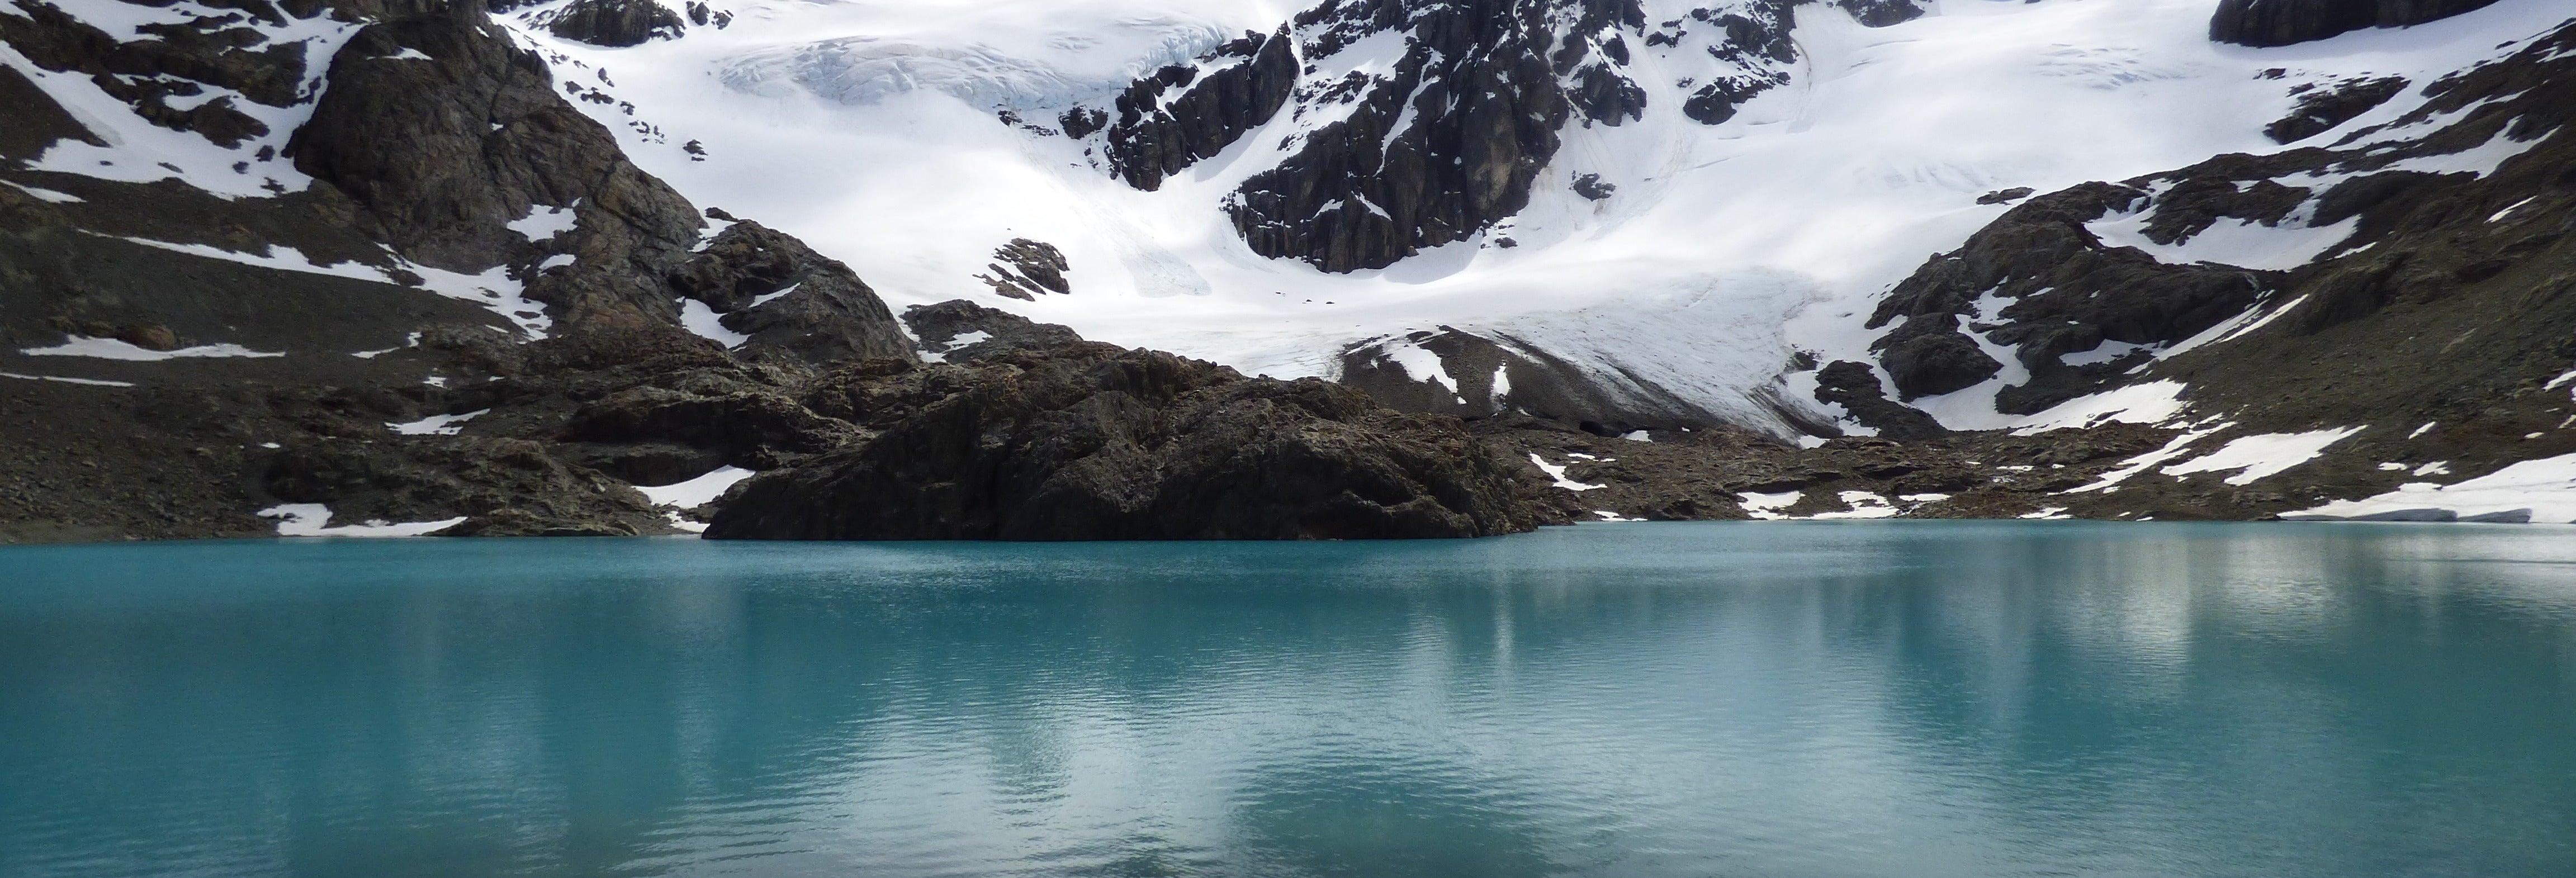 Trekking al ghiacciaio Vinciguerra